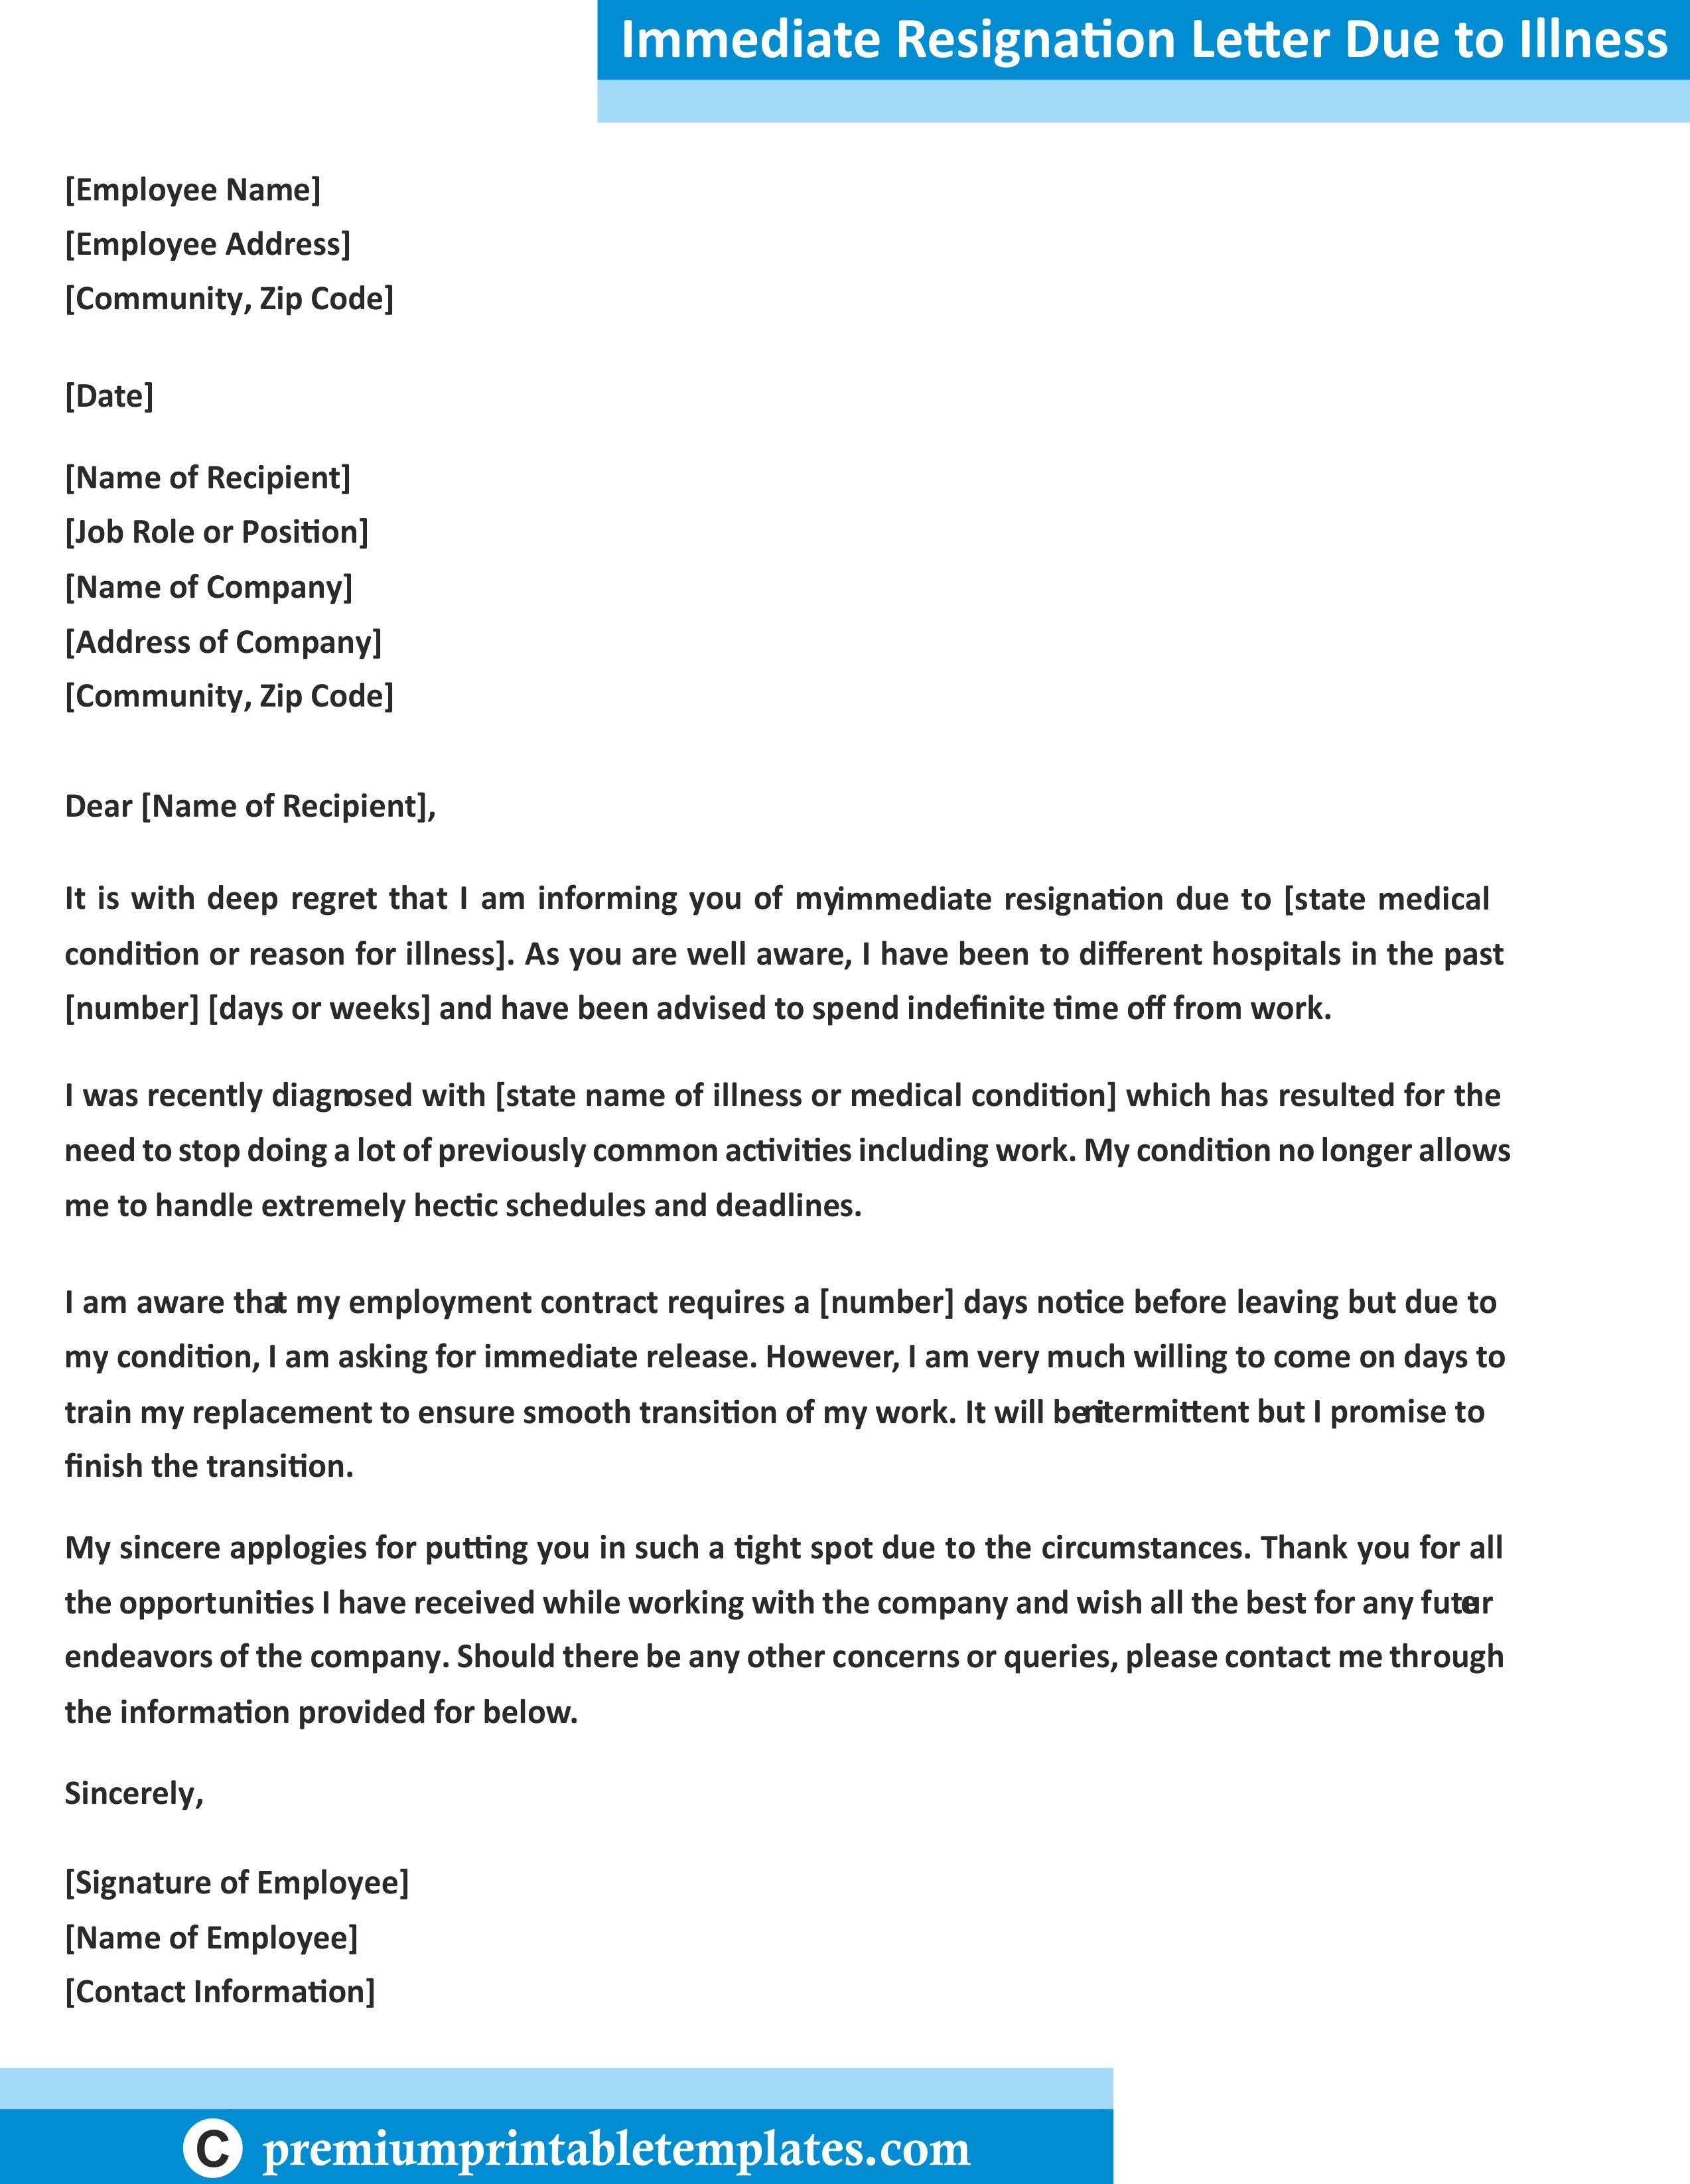 Immediate resignation letter due to illness premium printable immediate resignation letter due to illness 100 spiritdancerdesigns Choice Image